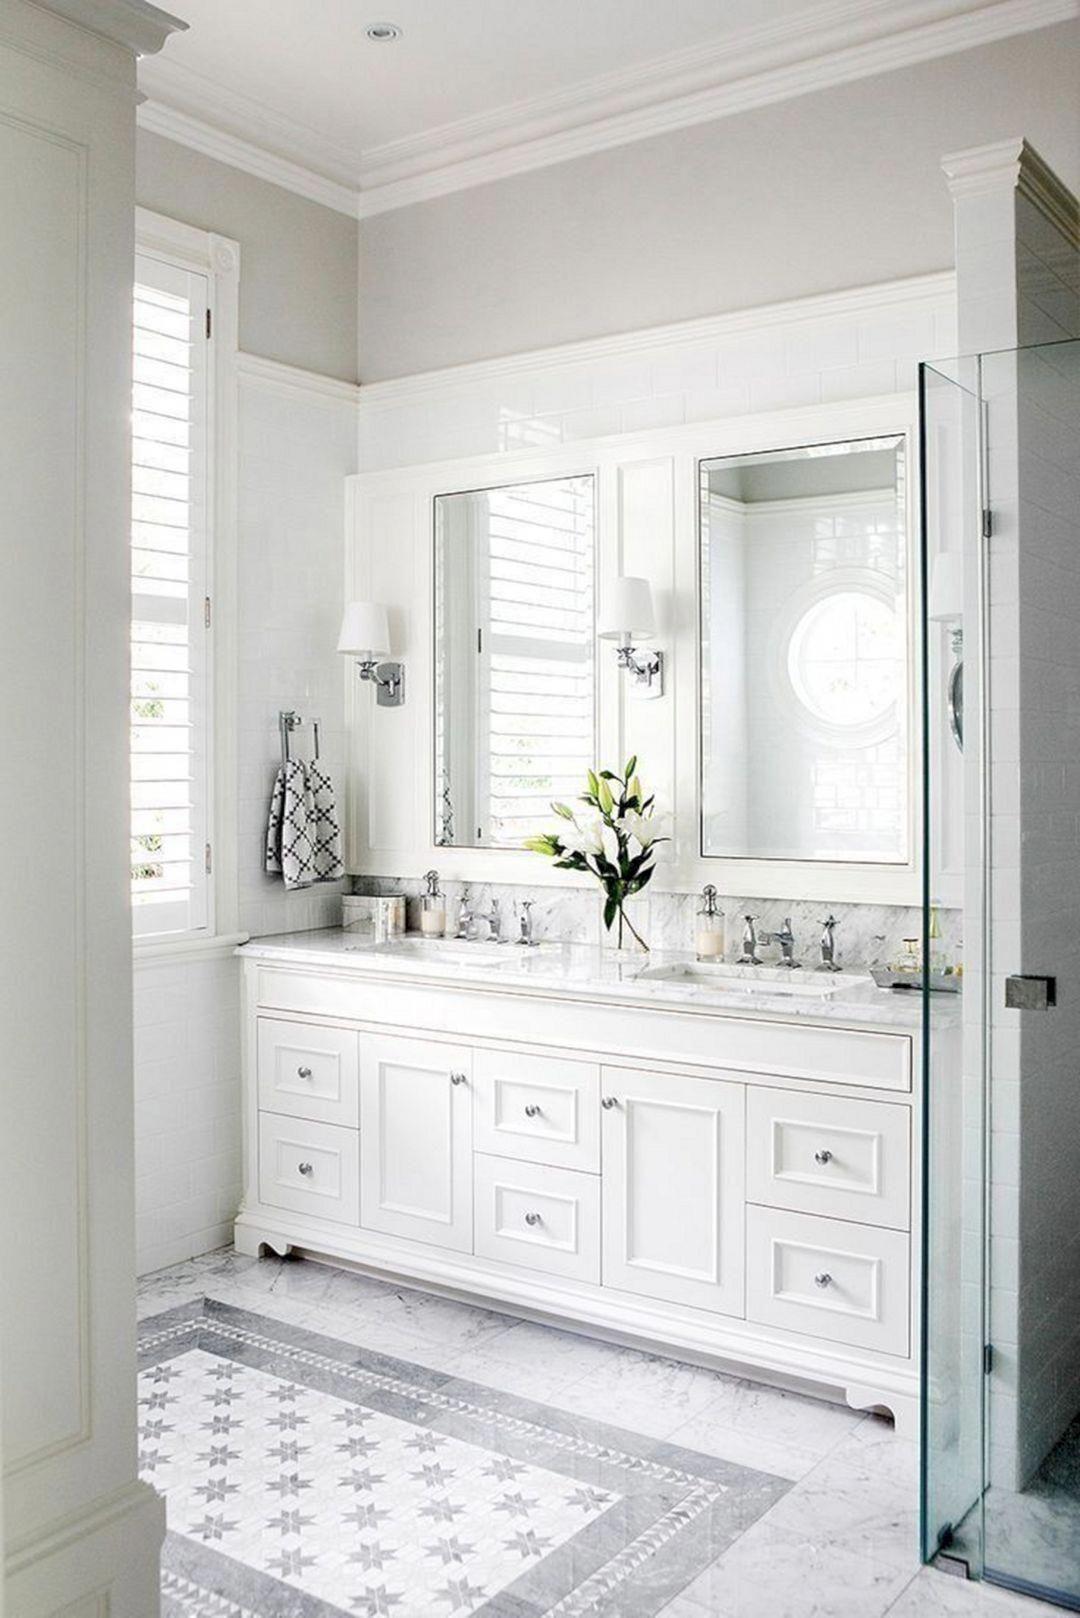 good looking photo bathroomtile bathroom remodel on bathroom renovation ideas white id=85379